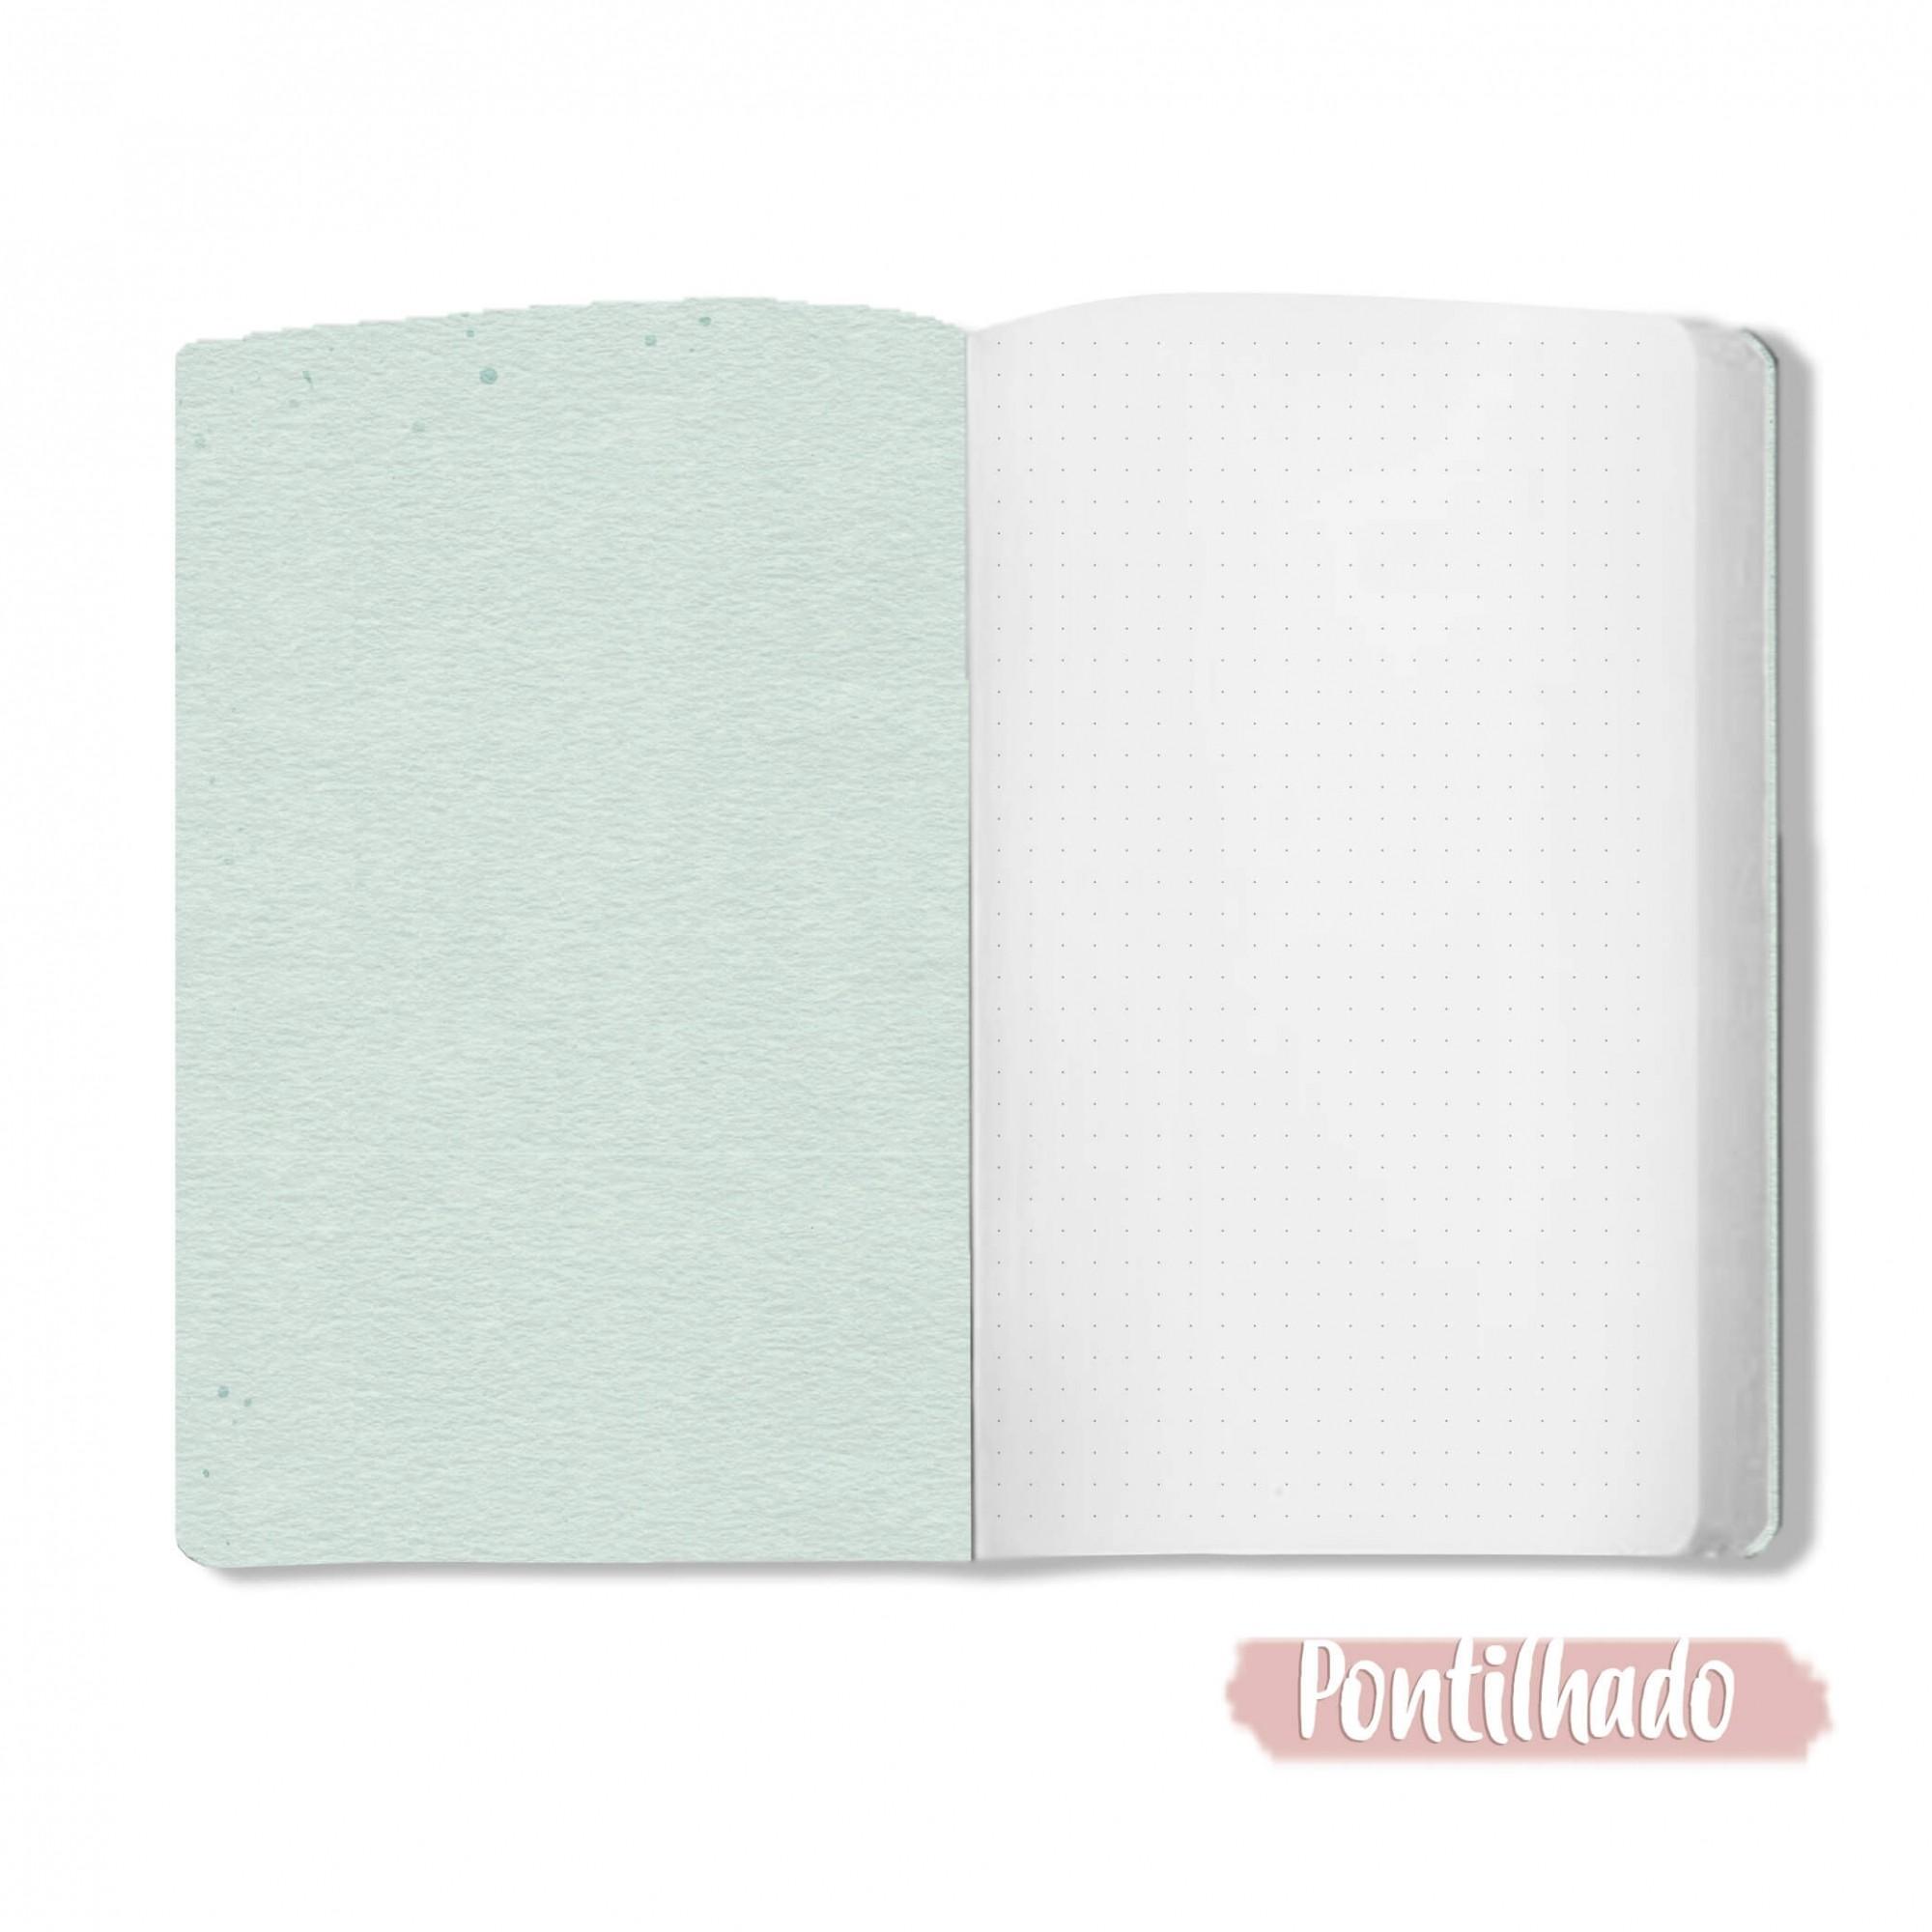 Caderno Cristalino - Scrap Minuto - Coleção Toda Básica / JuJu Scrapbook  - JuJu Scrapbook